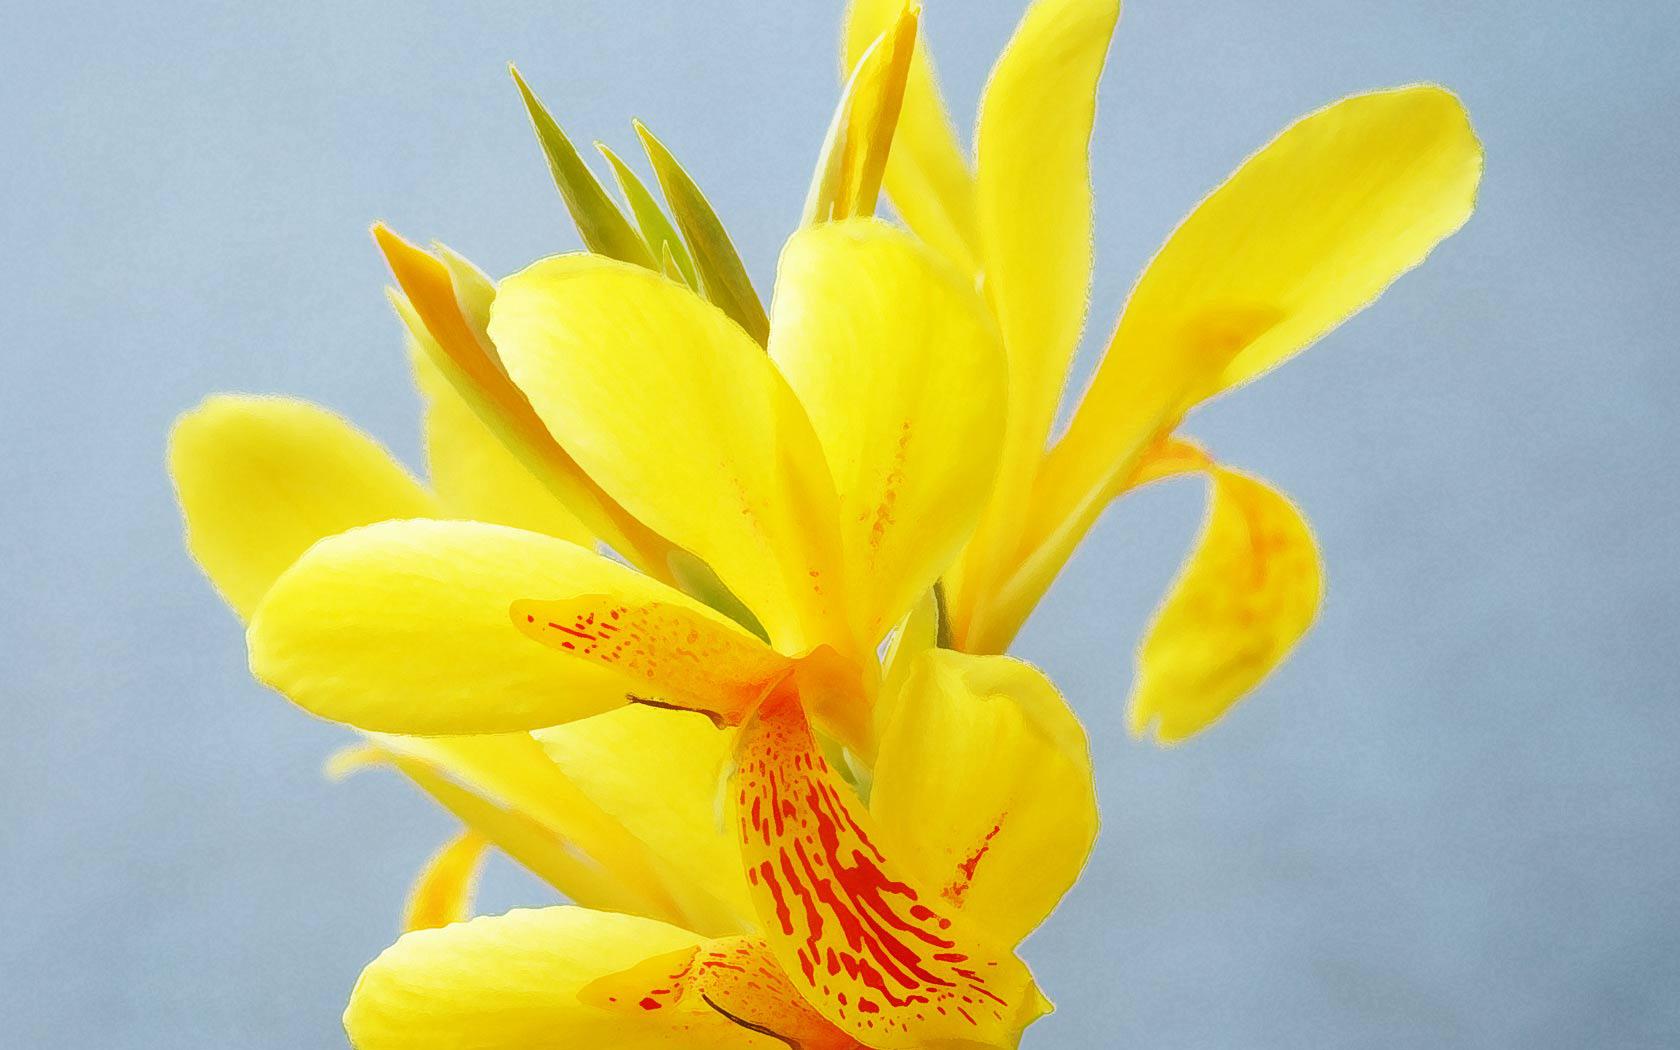 Hd wallpaper yellow flowers - Yellow Flowers Cool Wallpaper Yellow Flowers Cool Wallpaper Was Posted